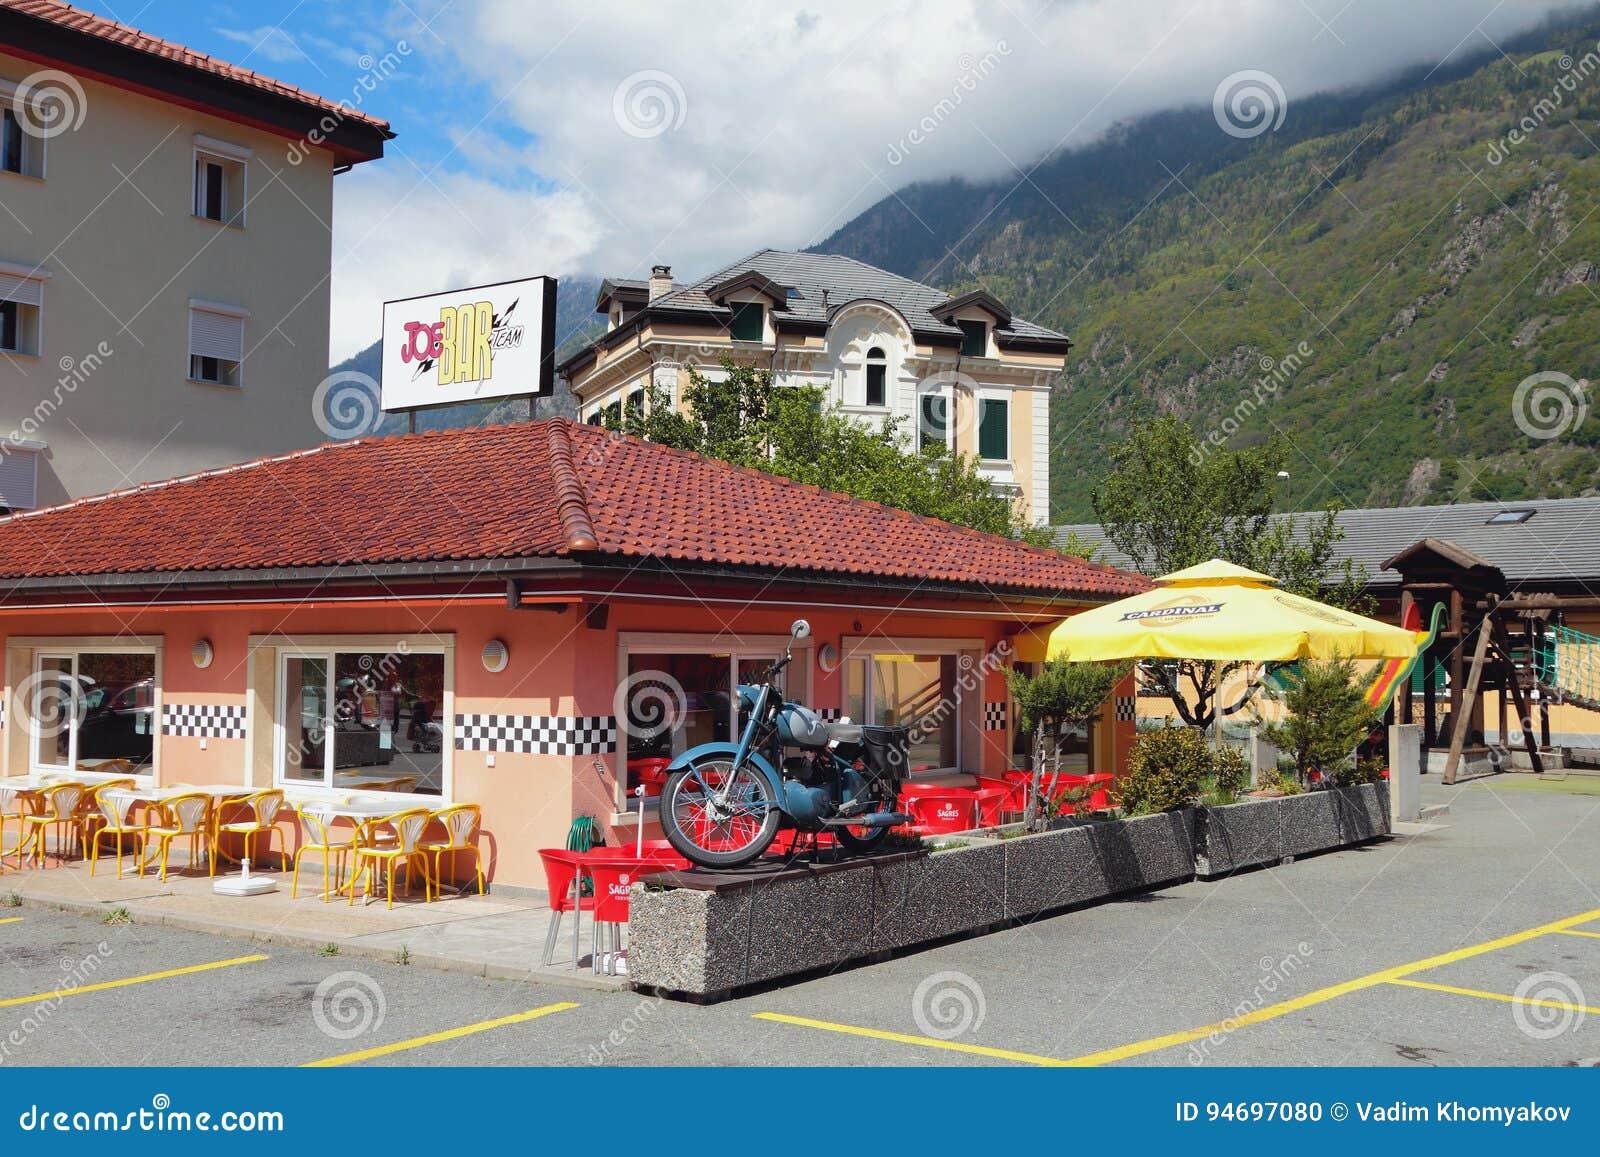 Cafe Prices In Switzerland